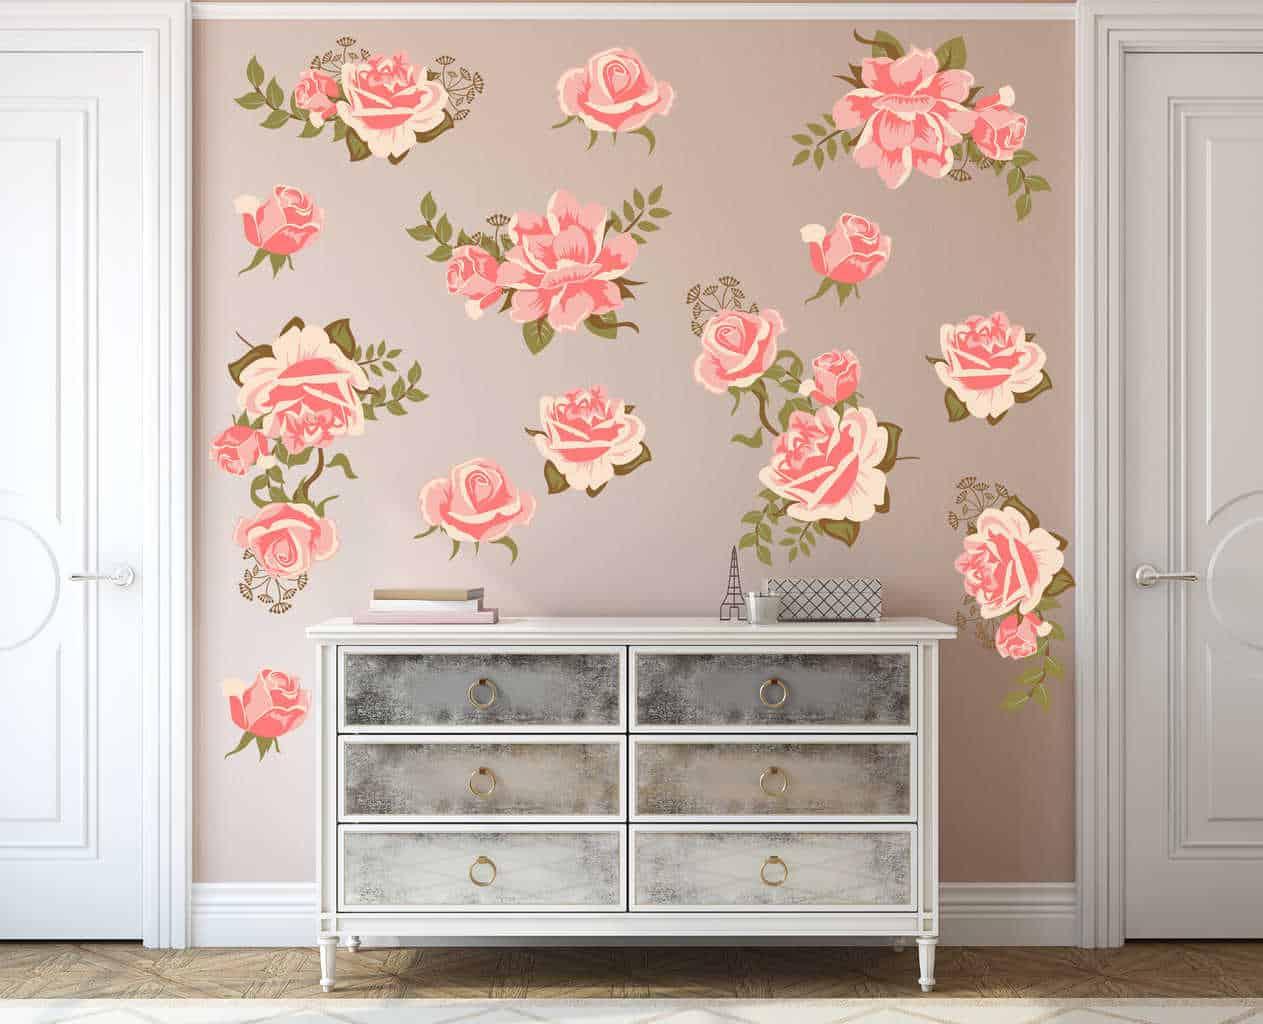 adbb745fe0 Pink Rose Flower Wall Decal Set Pink Rose Flower Wall Decal Set, Pretty  Pink Graphic Flower Wall Decal Set, ...